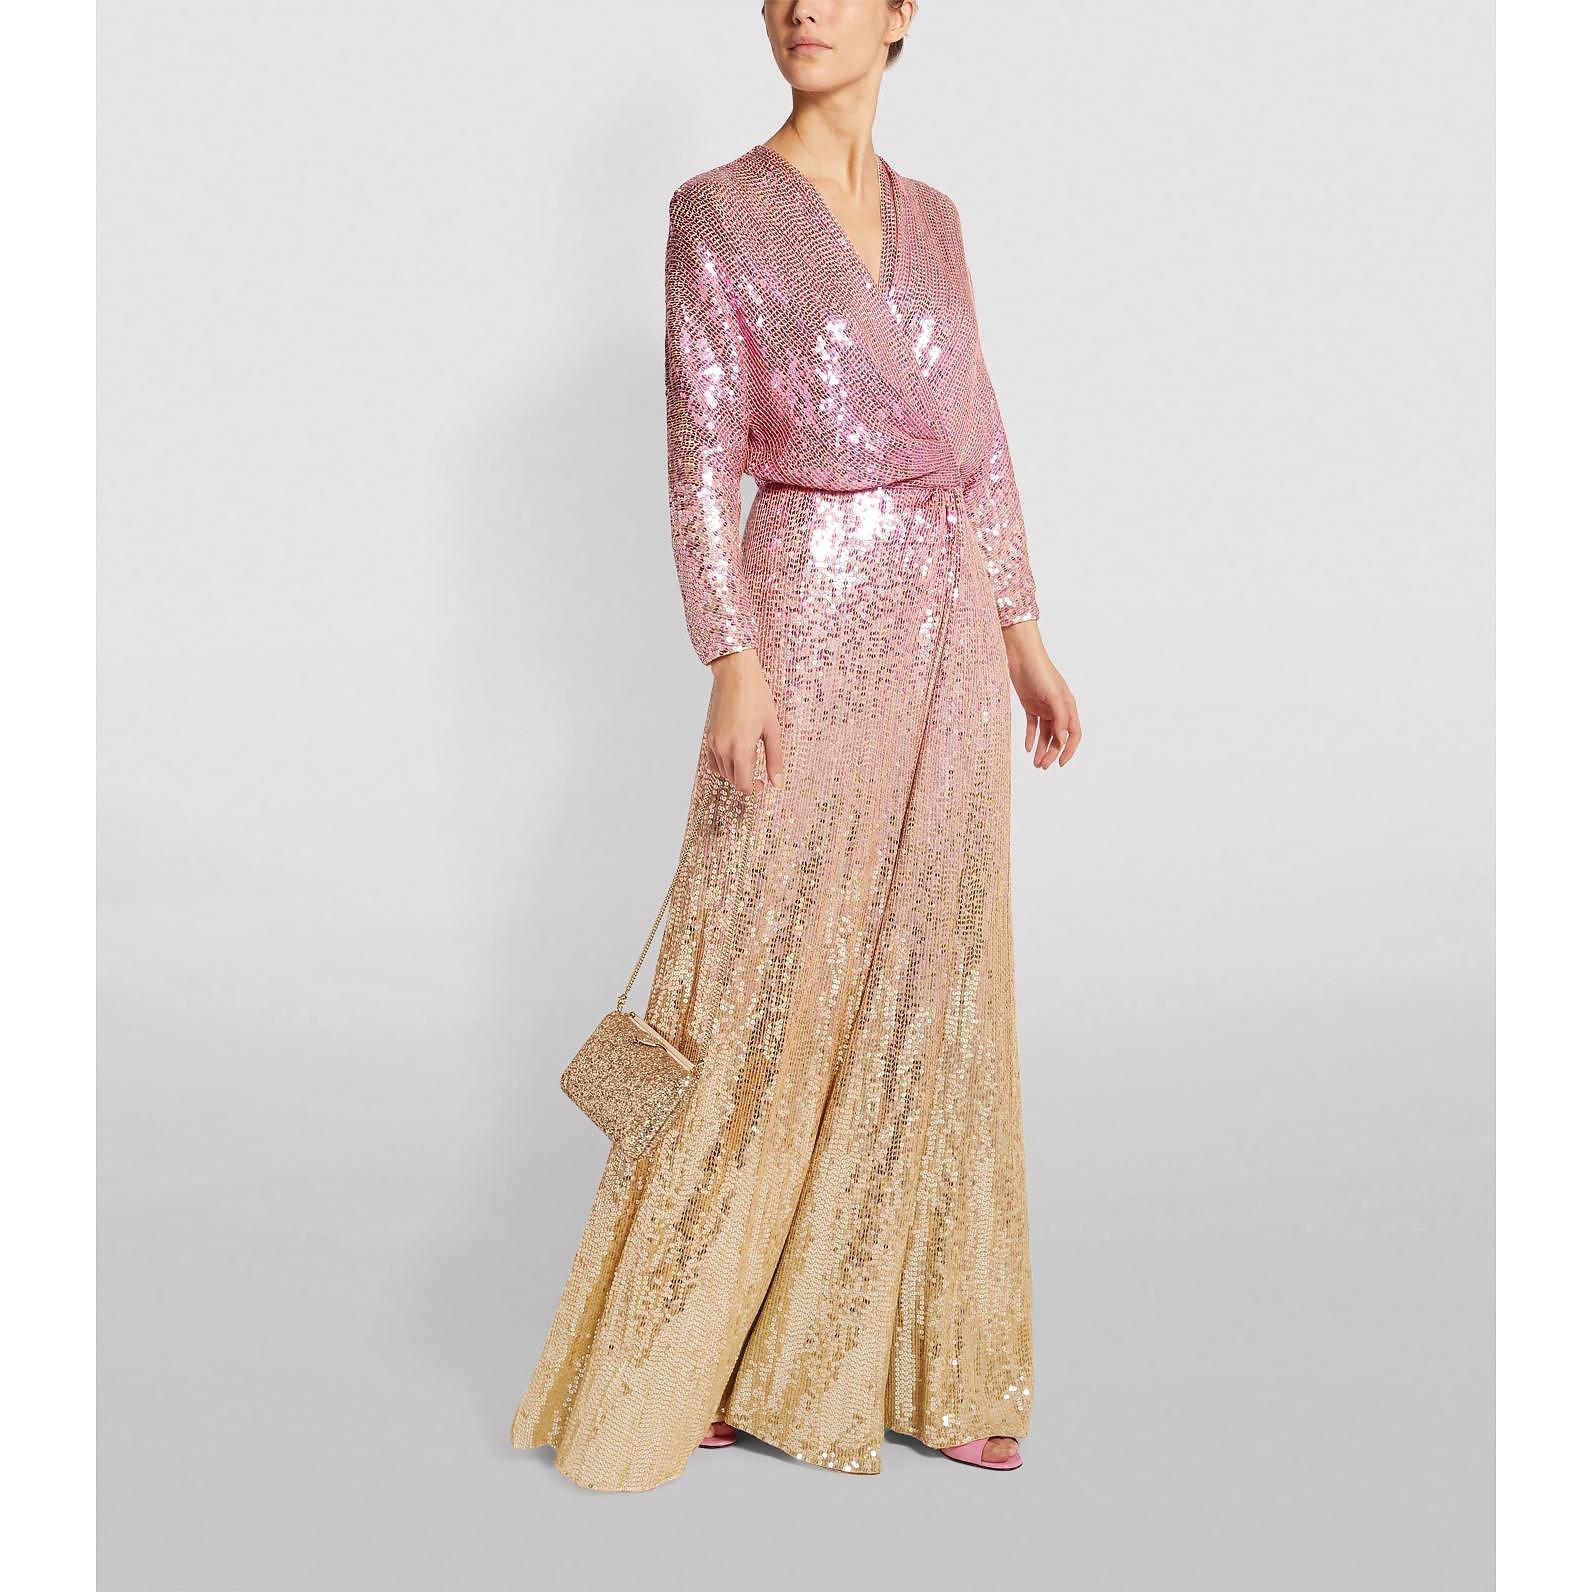 Jenny Packham Gina Ombré Sequin Wrap Gown